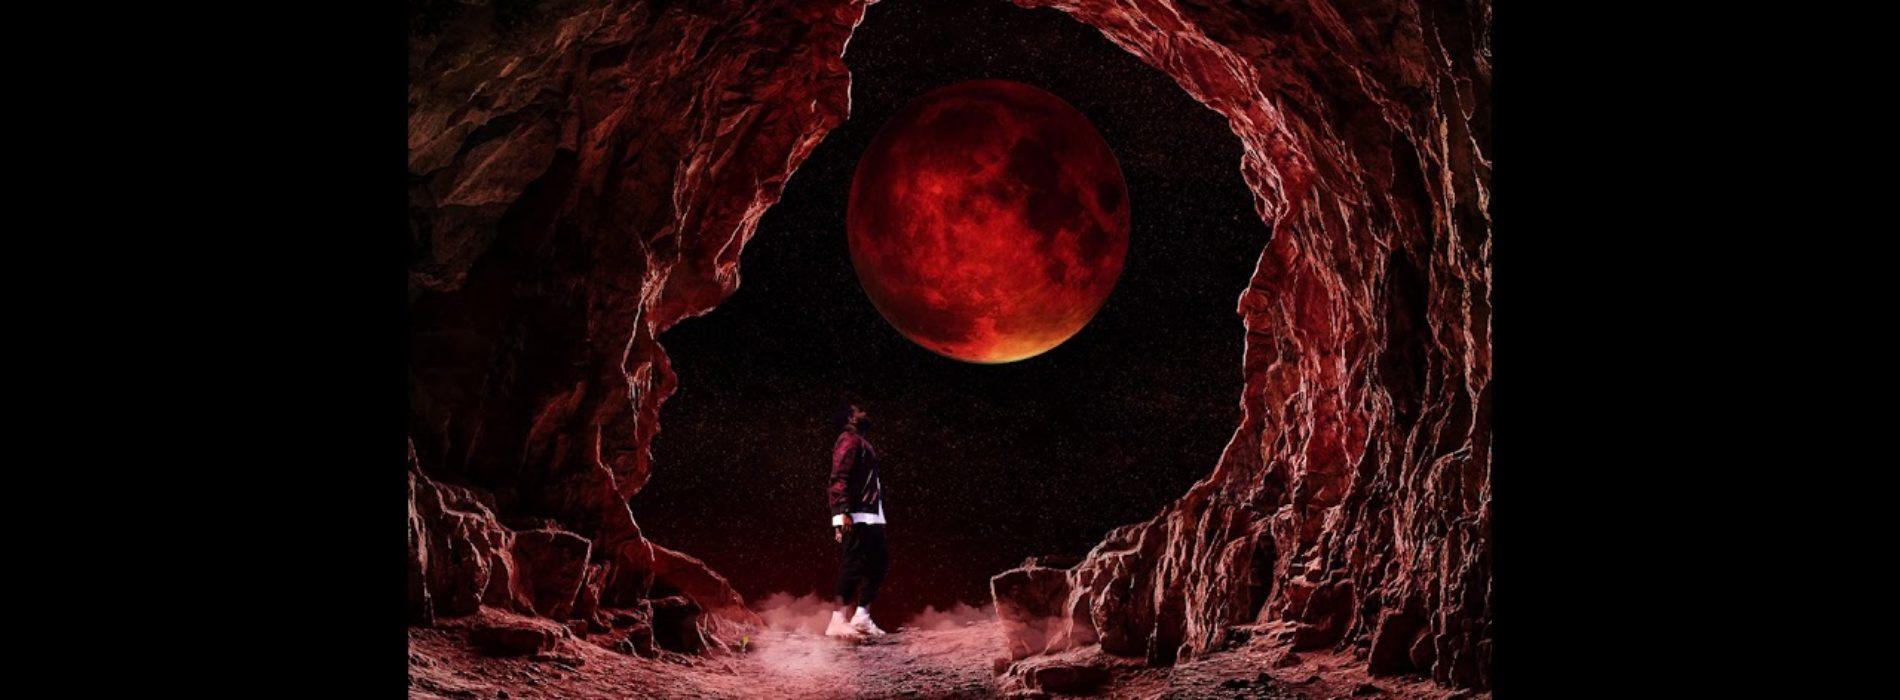 SSKYRON 2 titres – QLF / Aller au large (Red Moon) – Janvier 2019